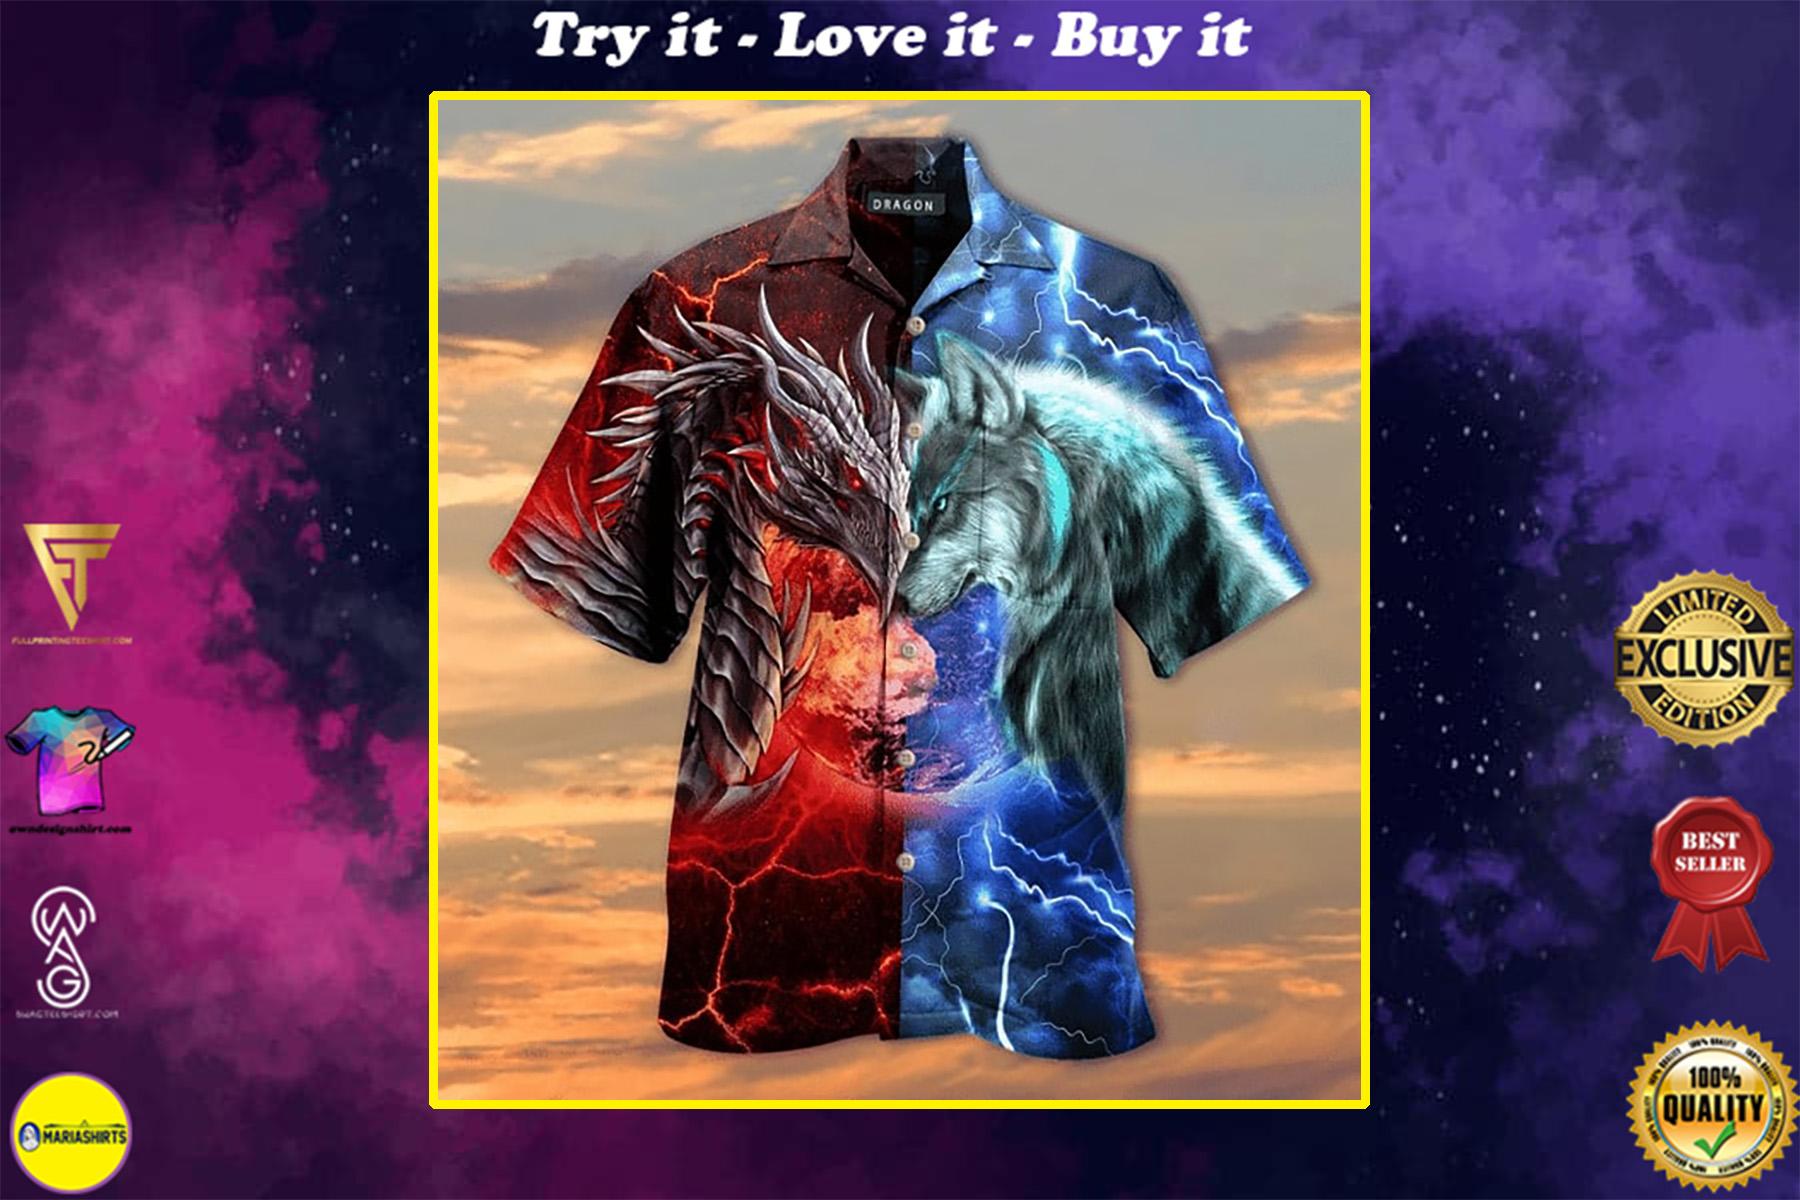 spirit of a dragon heart of a wolf all over printed hawaiian shirt